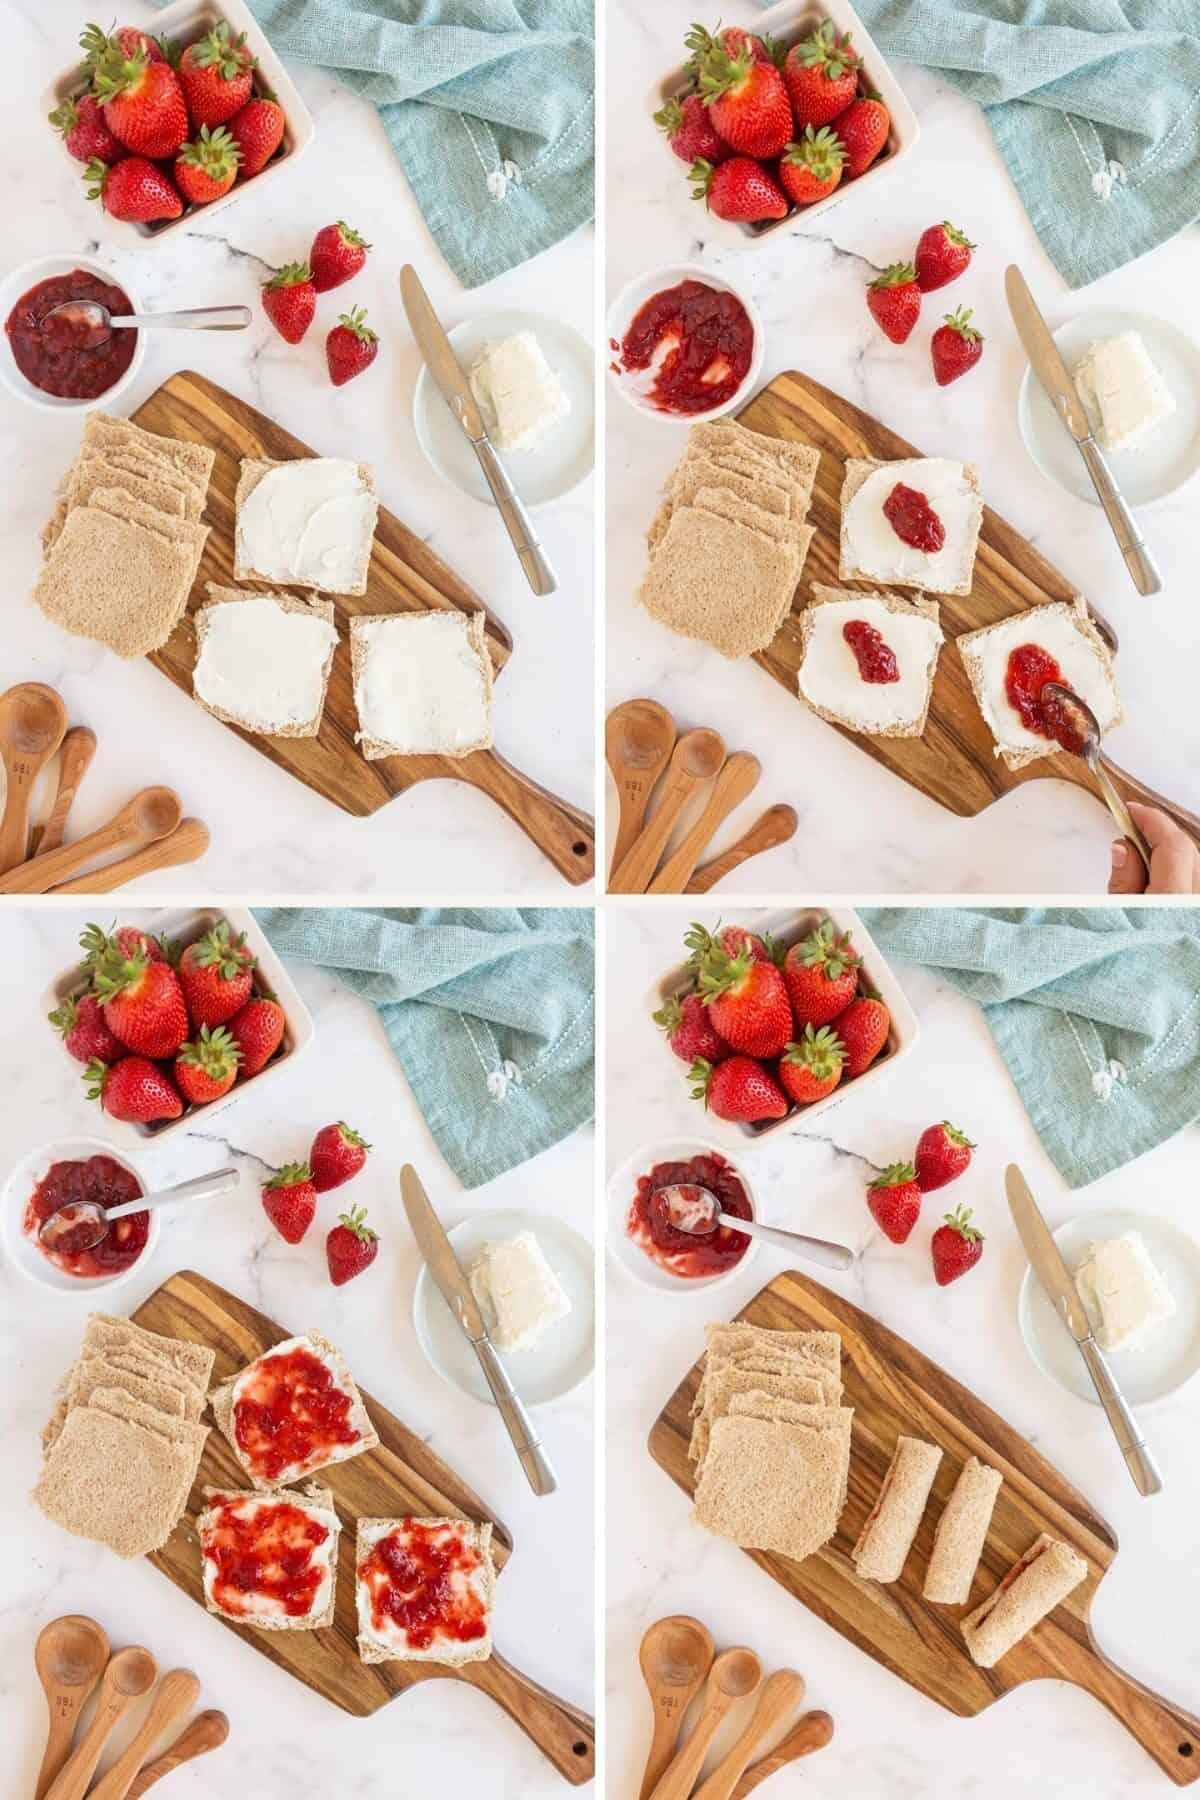 making strawberry cheesecake roll ups